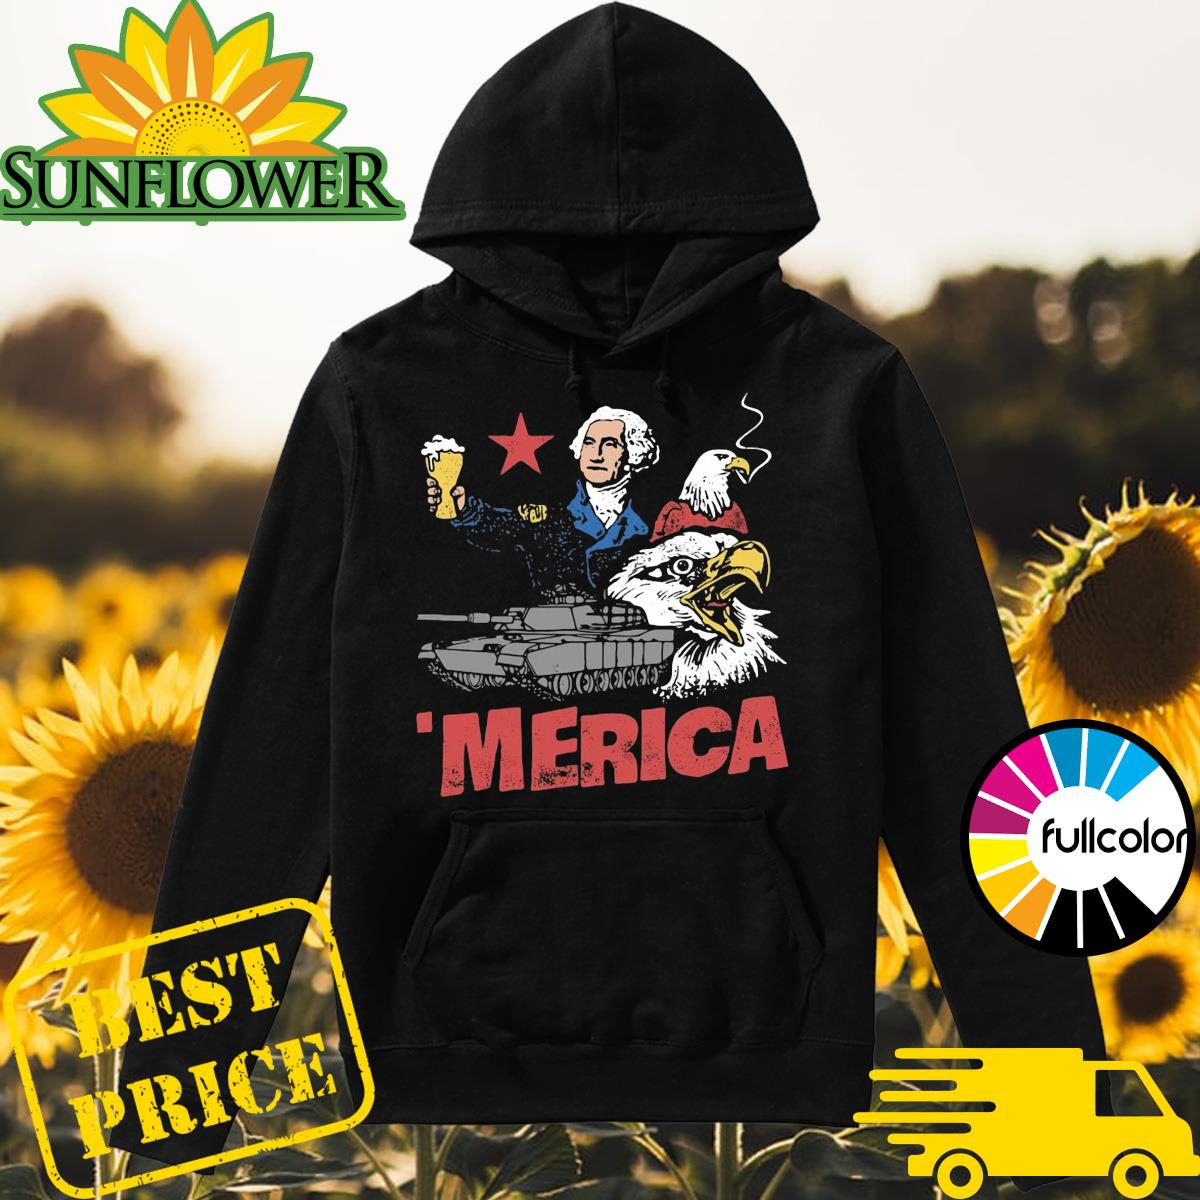 _Merica Eagle American Shirt Hoodie